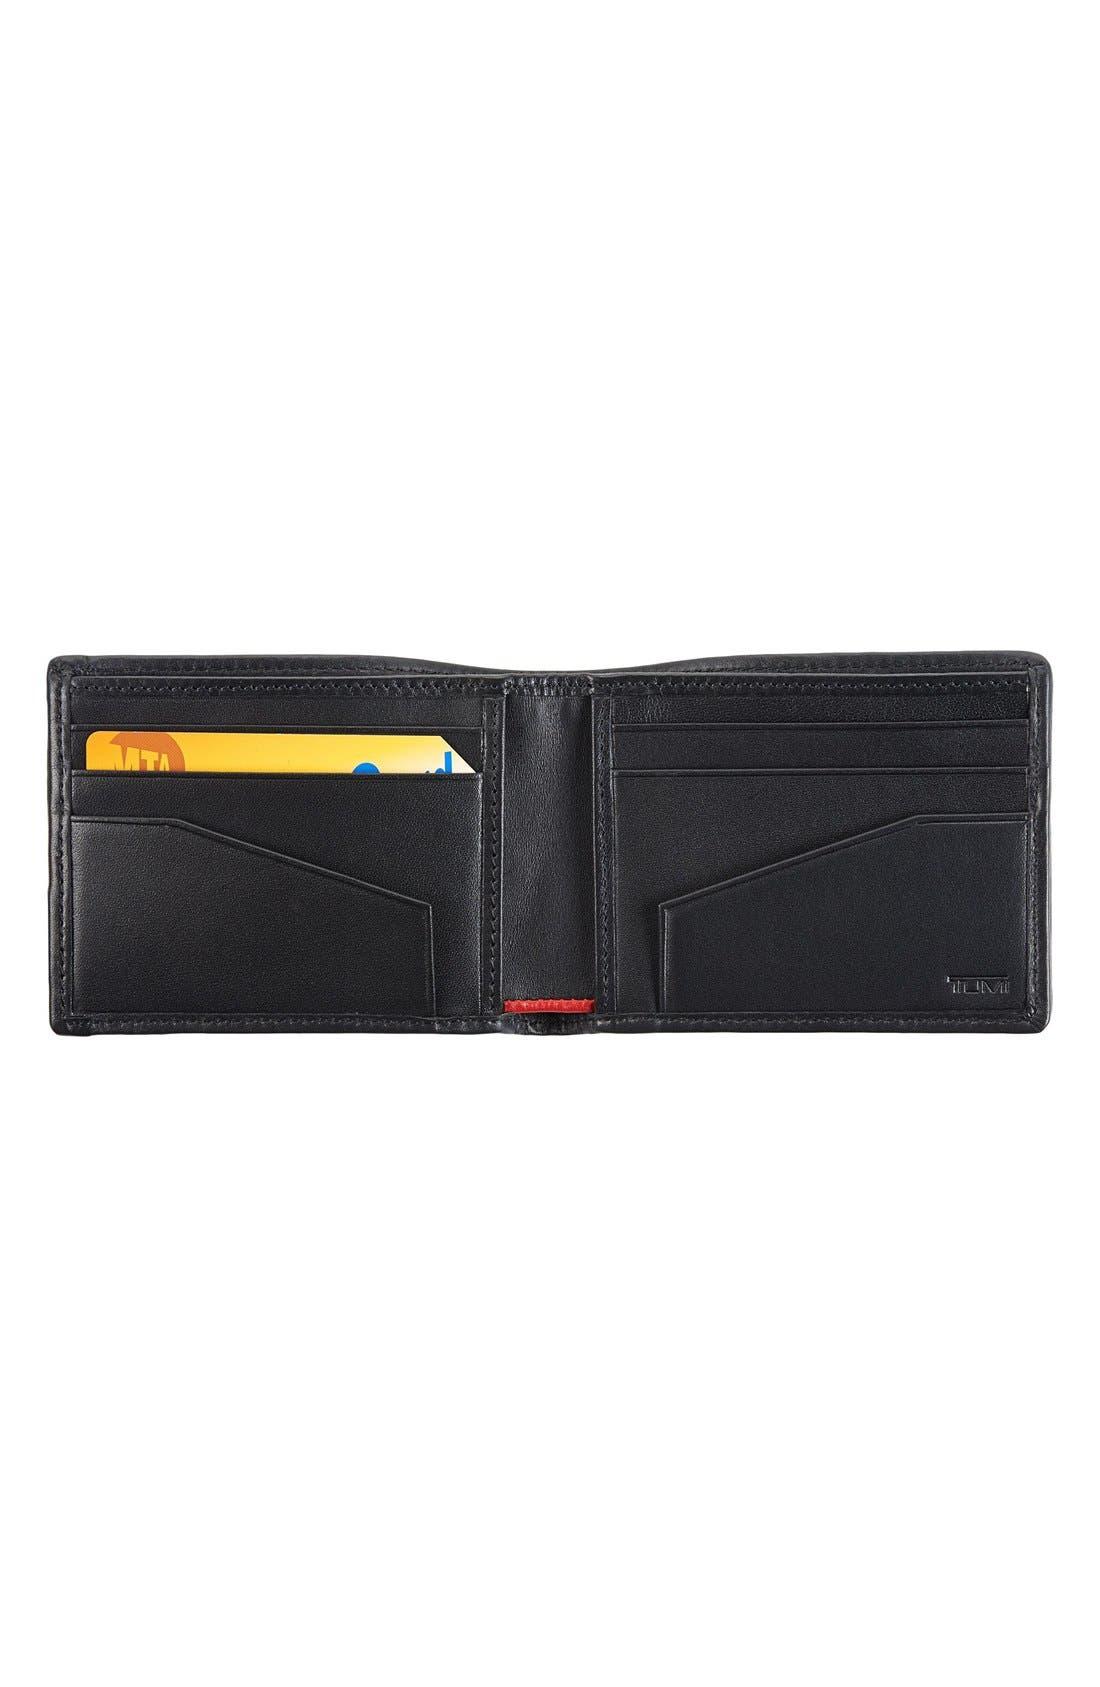 Alpha Billfold Wallet,                             Alternate thumbnail 2, color,                             BLACK